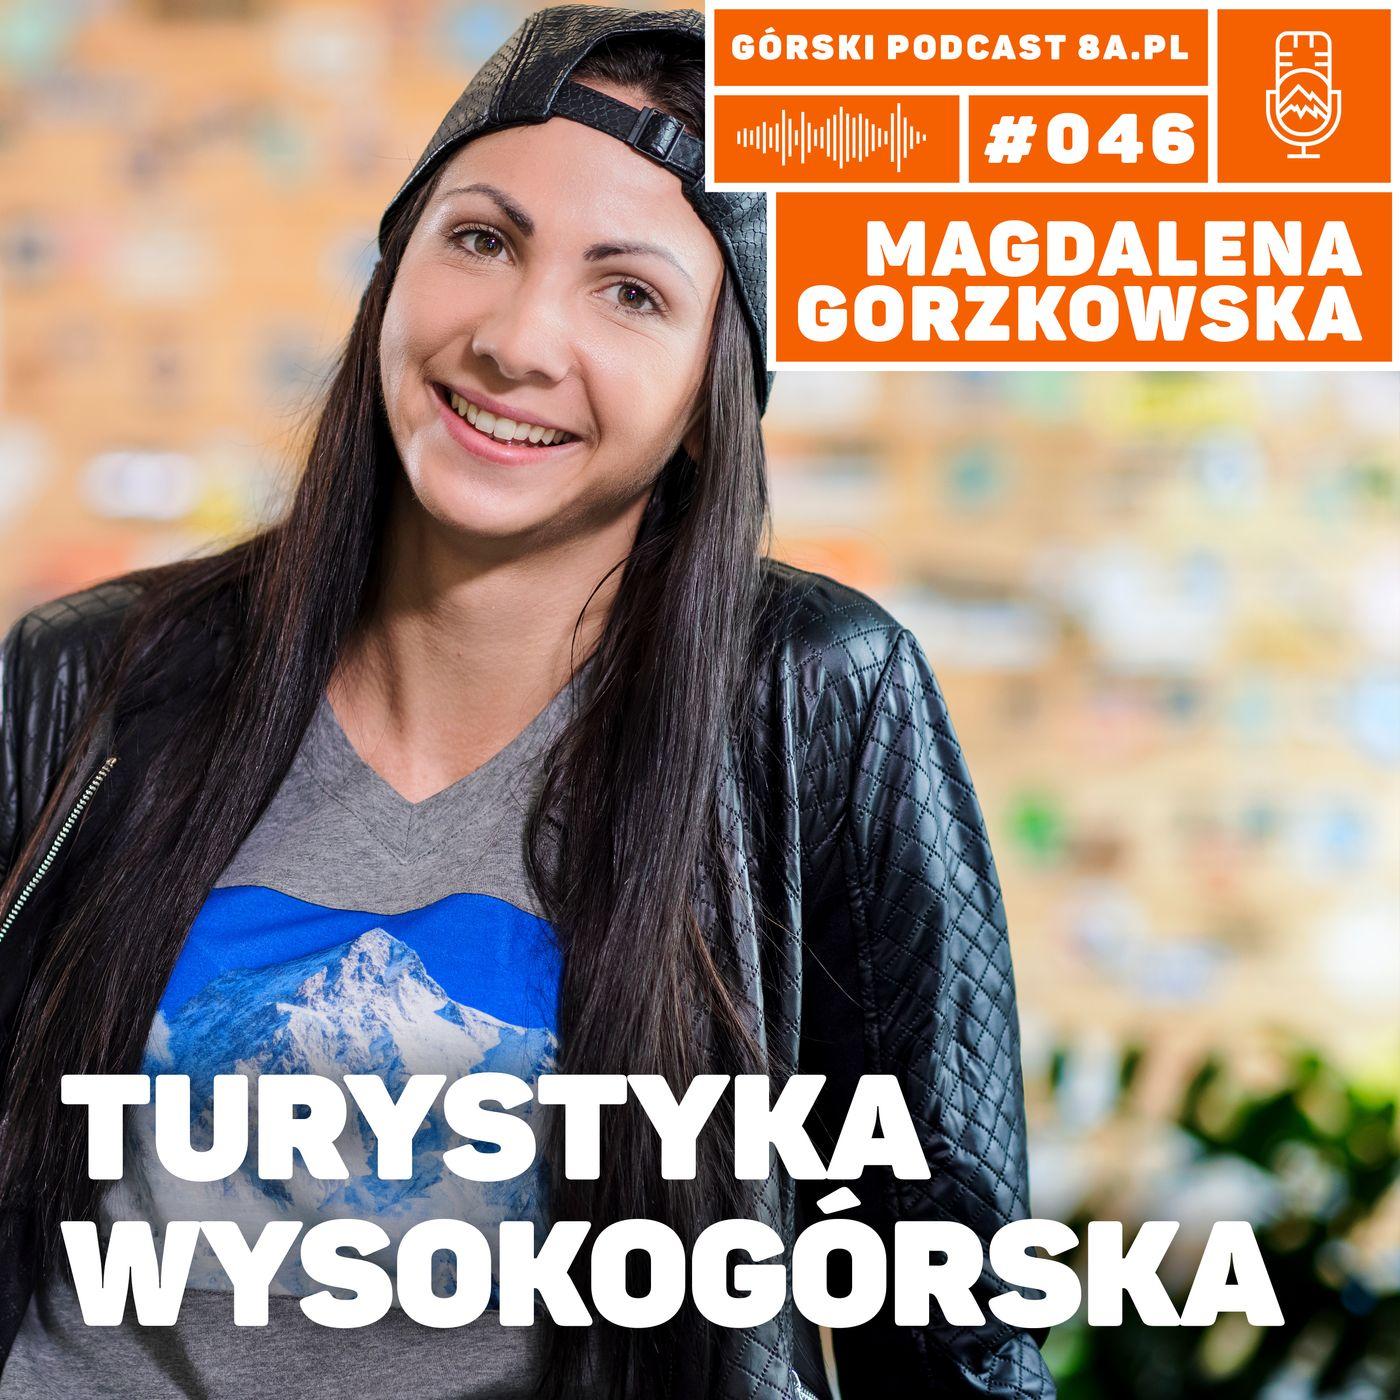 #046 8a.pl - Magdalena Gorzkowska. Turystyka Wysokogórska.